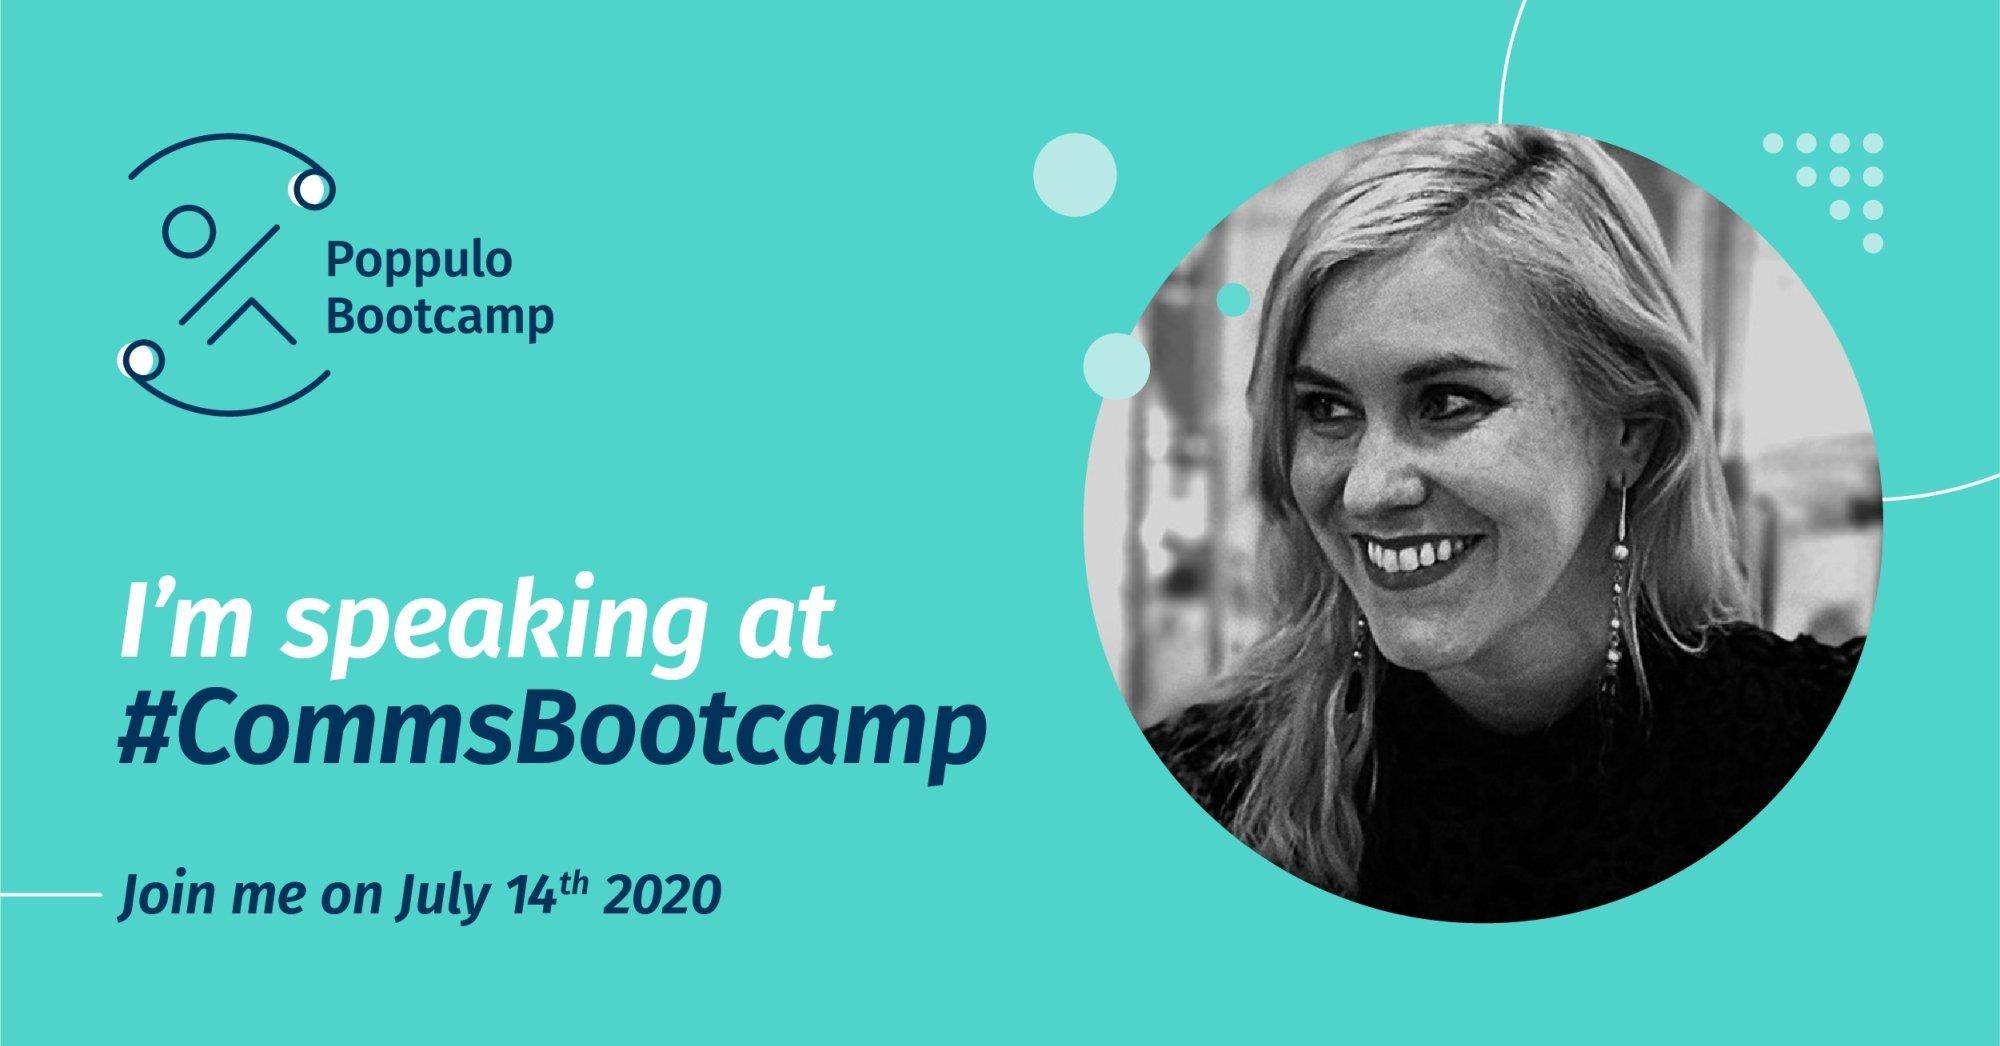 Poppulo bootcamp social speakers lindsay